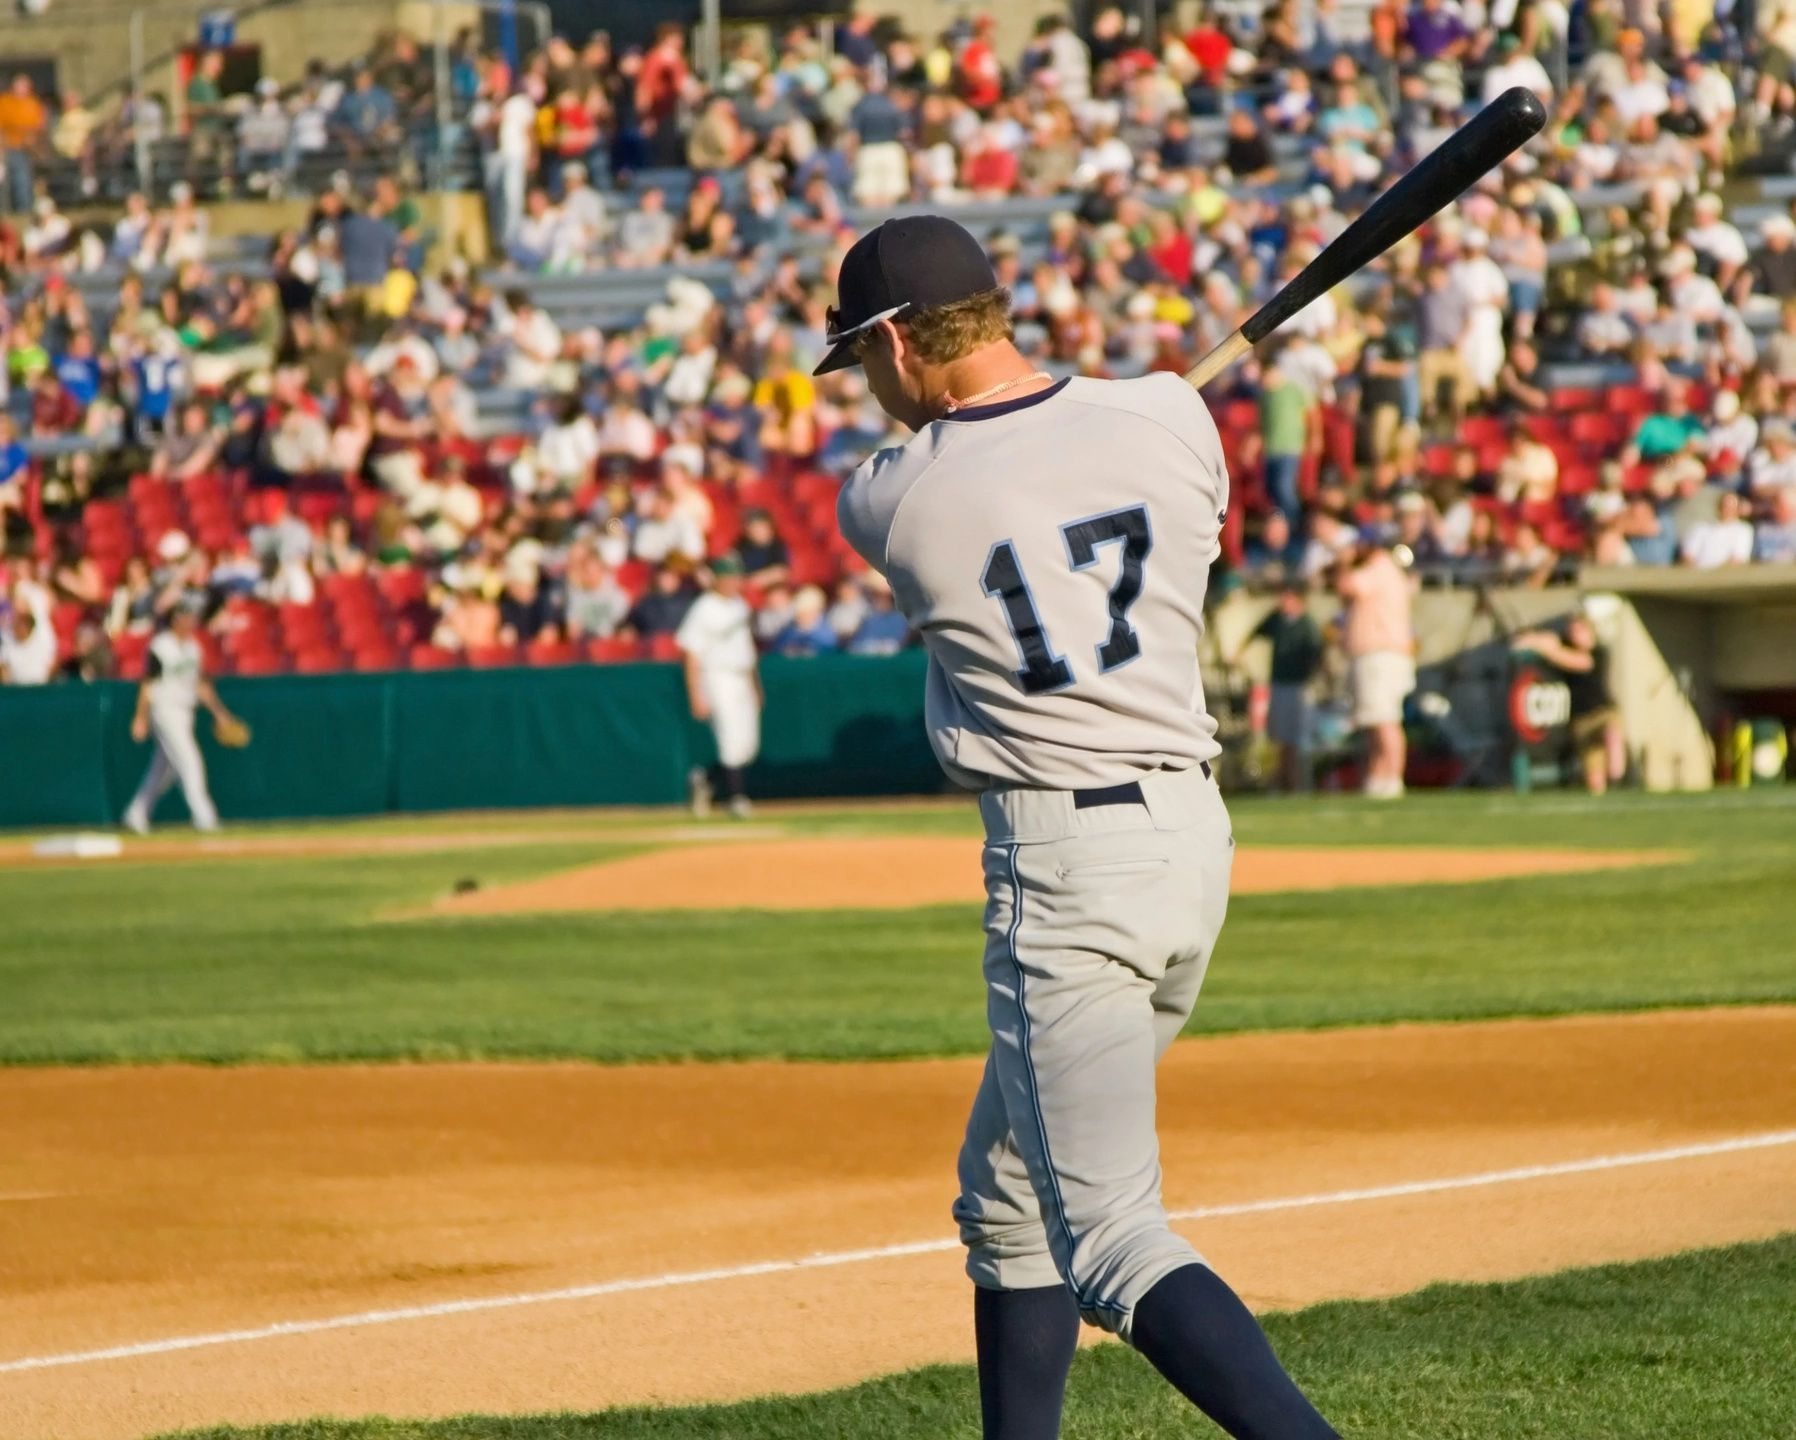 Baseball Hitting Lessons | Youth Baseball Training